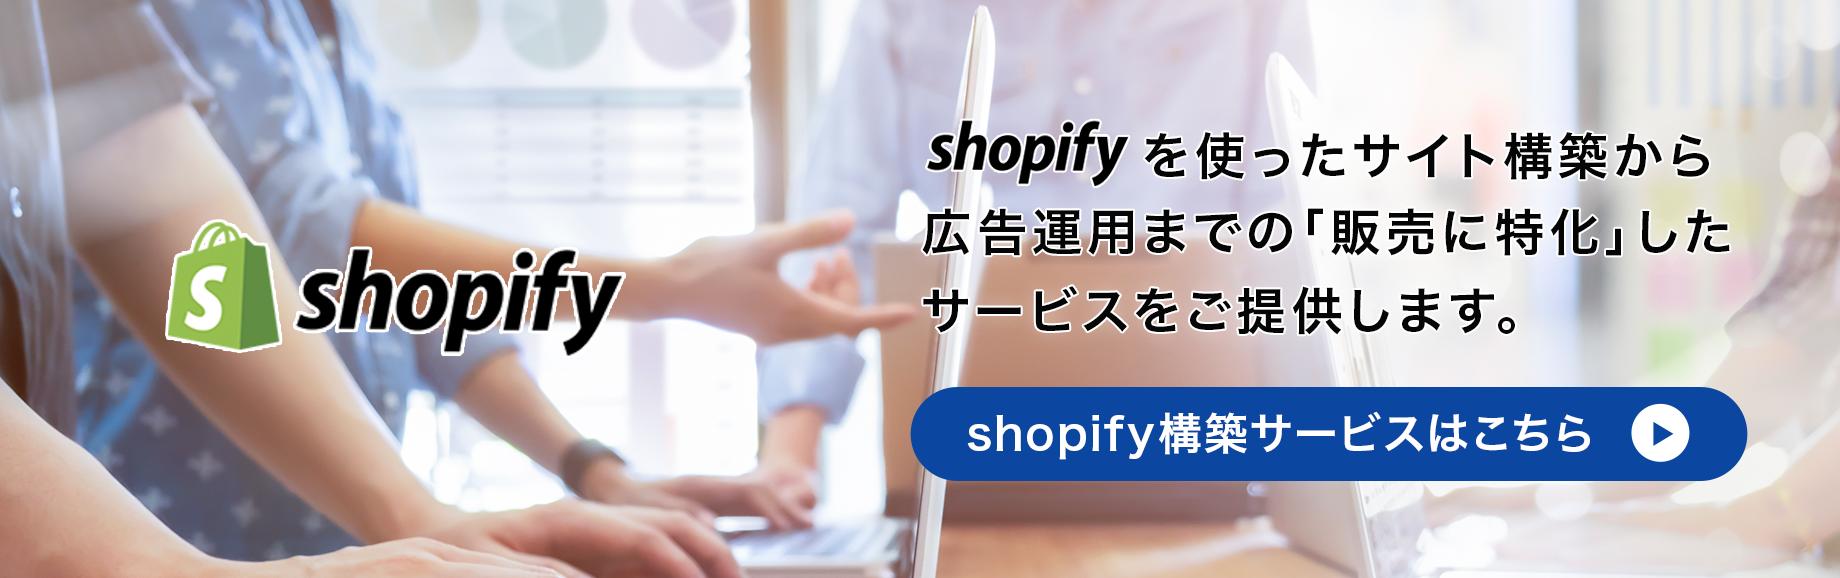 shopify構築サービスはこちら